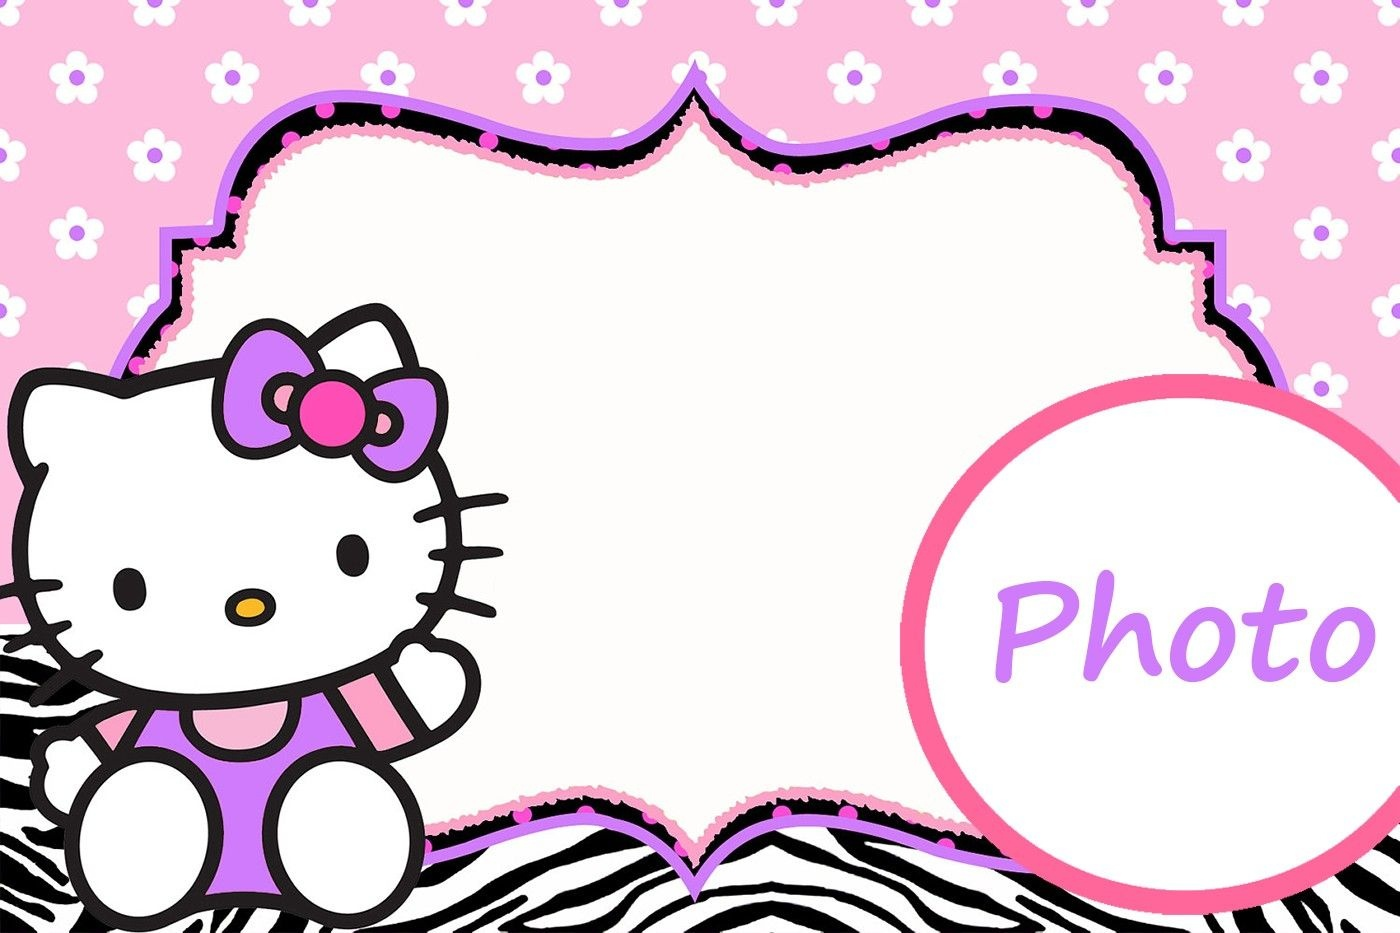 Personalized Hello Kitty Invitation Template   Hello Kitty   Hello - Free Printable Hello Kitty Pictures